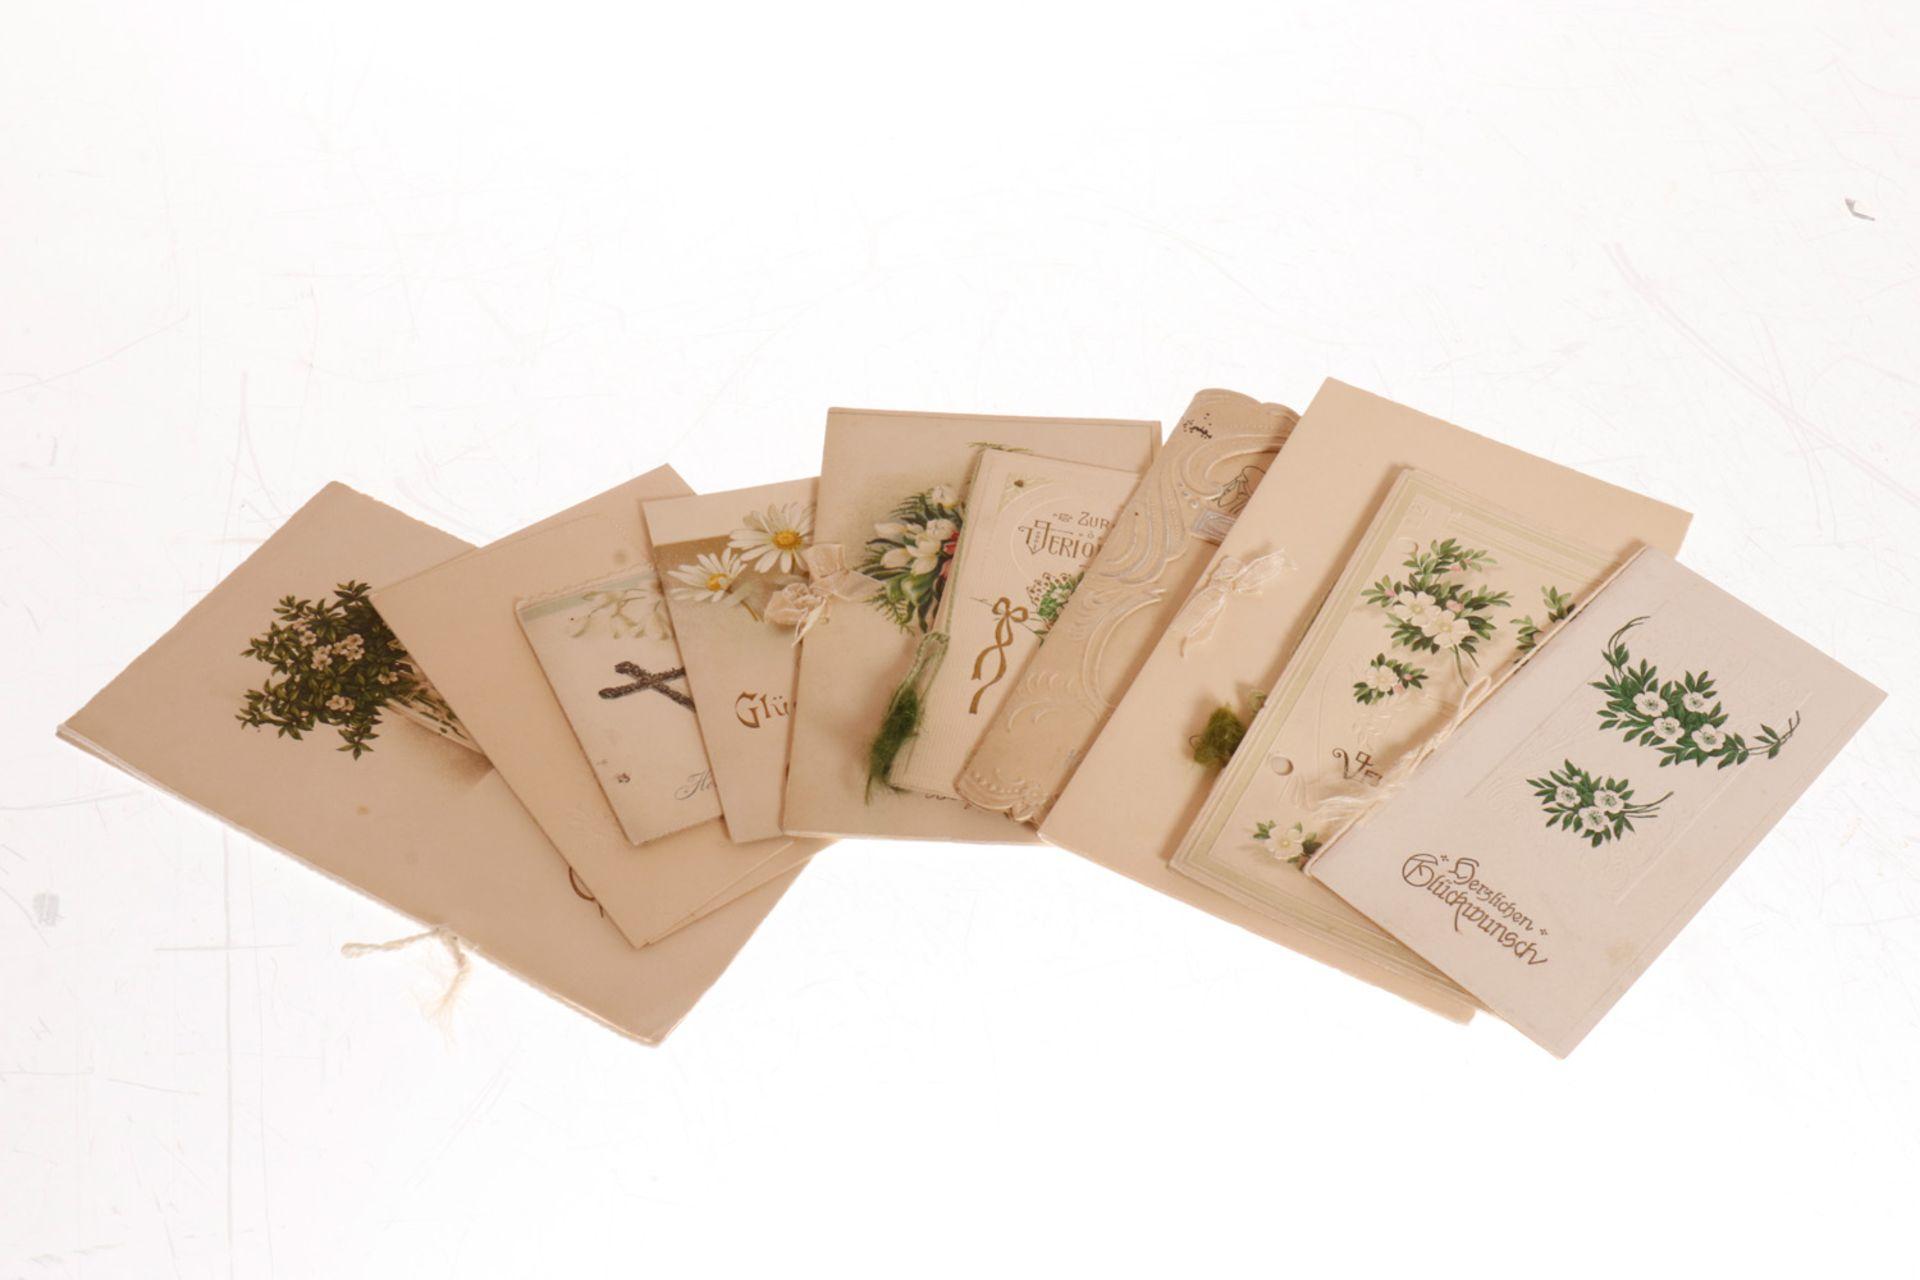 Konv. 10 Glückwunschkarten, meist um 1900/1920, darunter Jugendstil, tw polychromer Prägedruck, 1